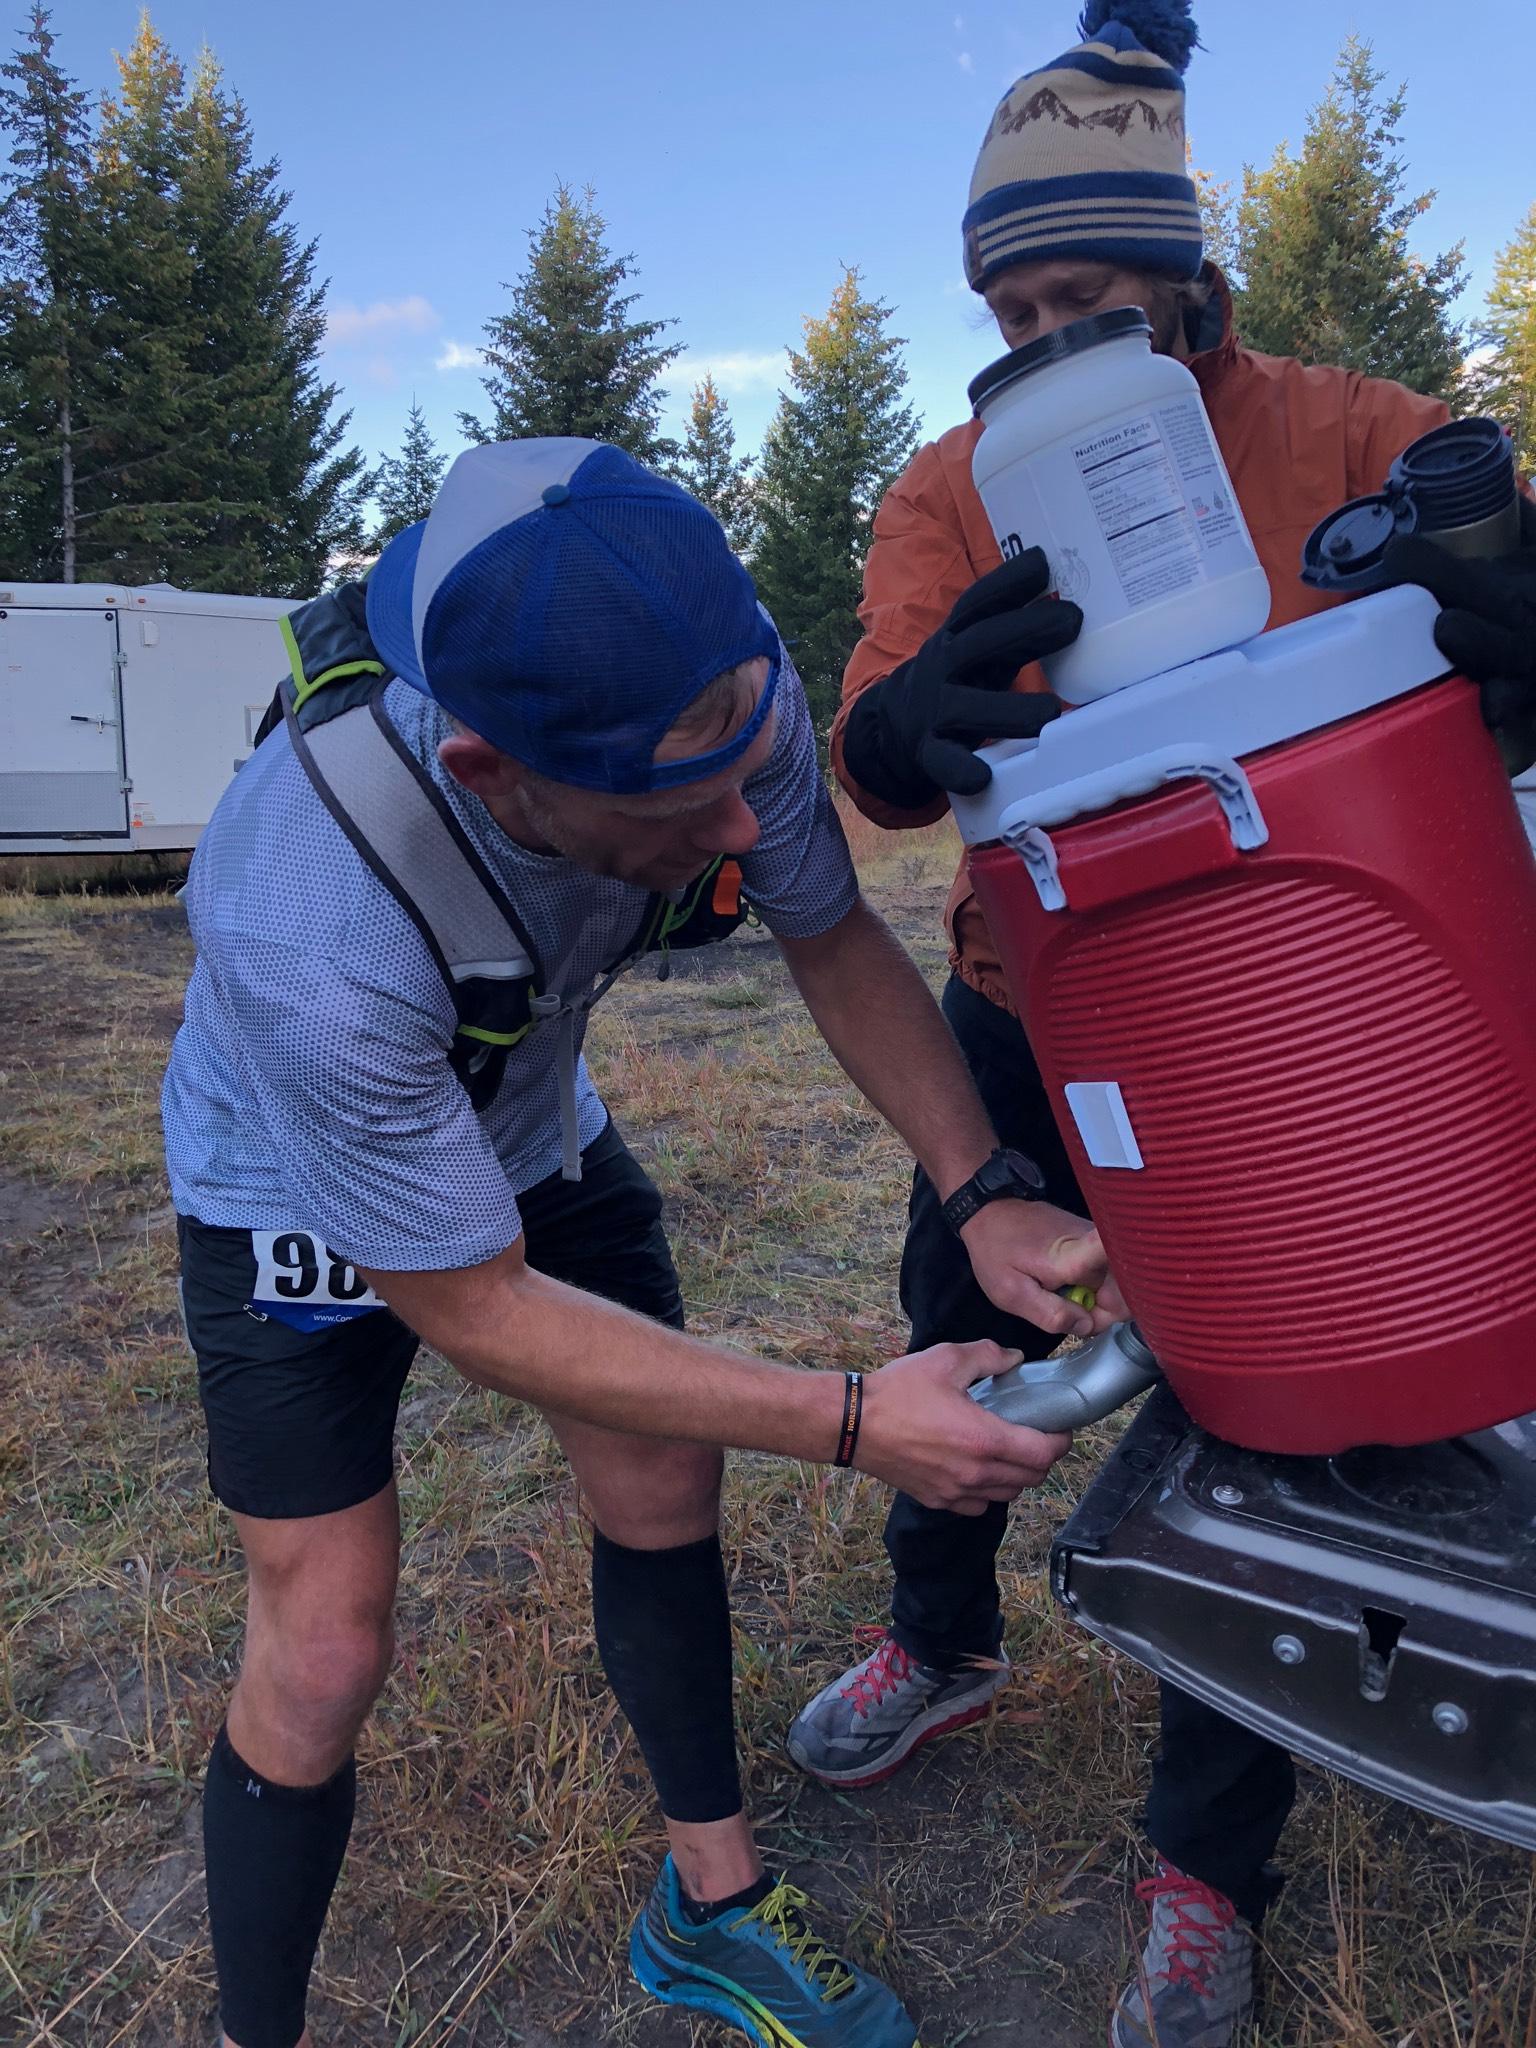 foys to blacktail trails trail marathon ftbtIMG_1781.JPG